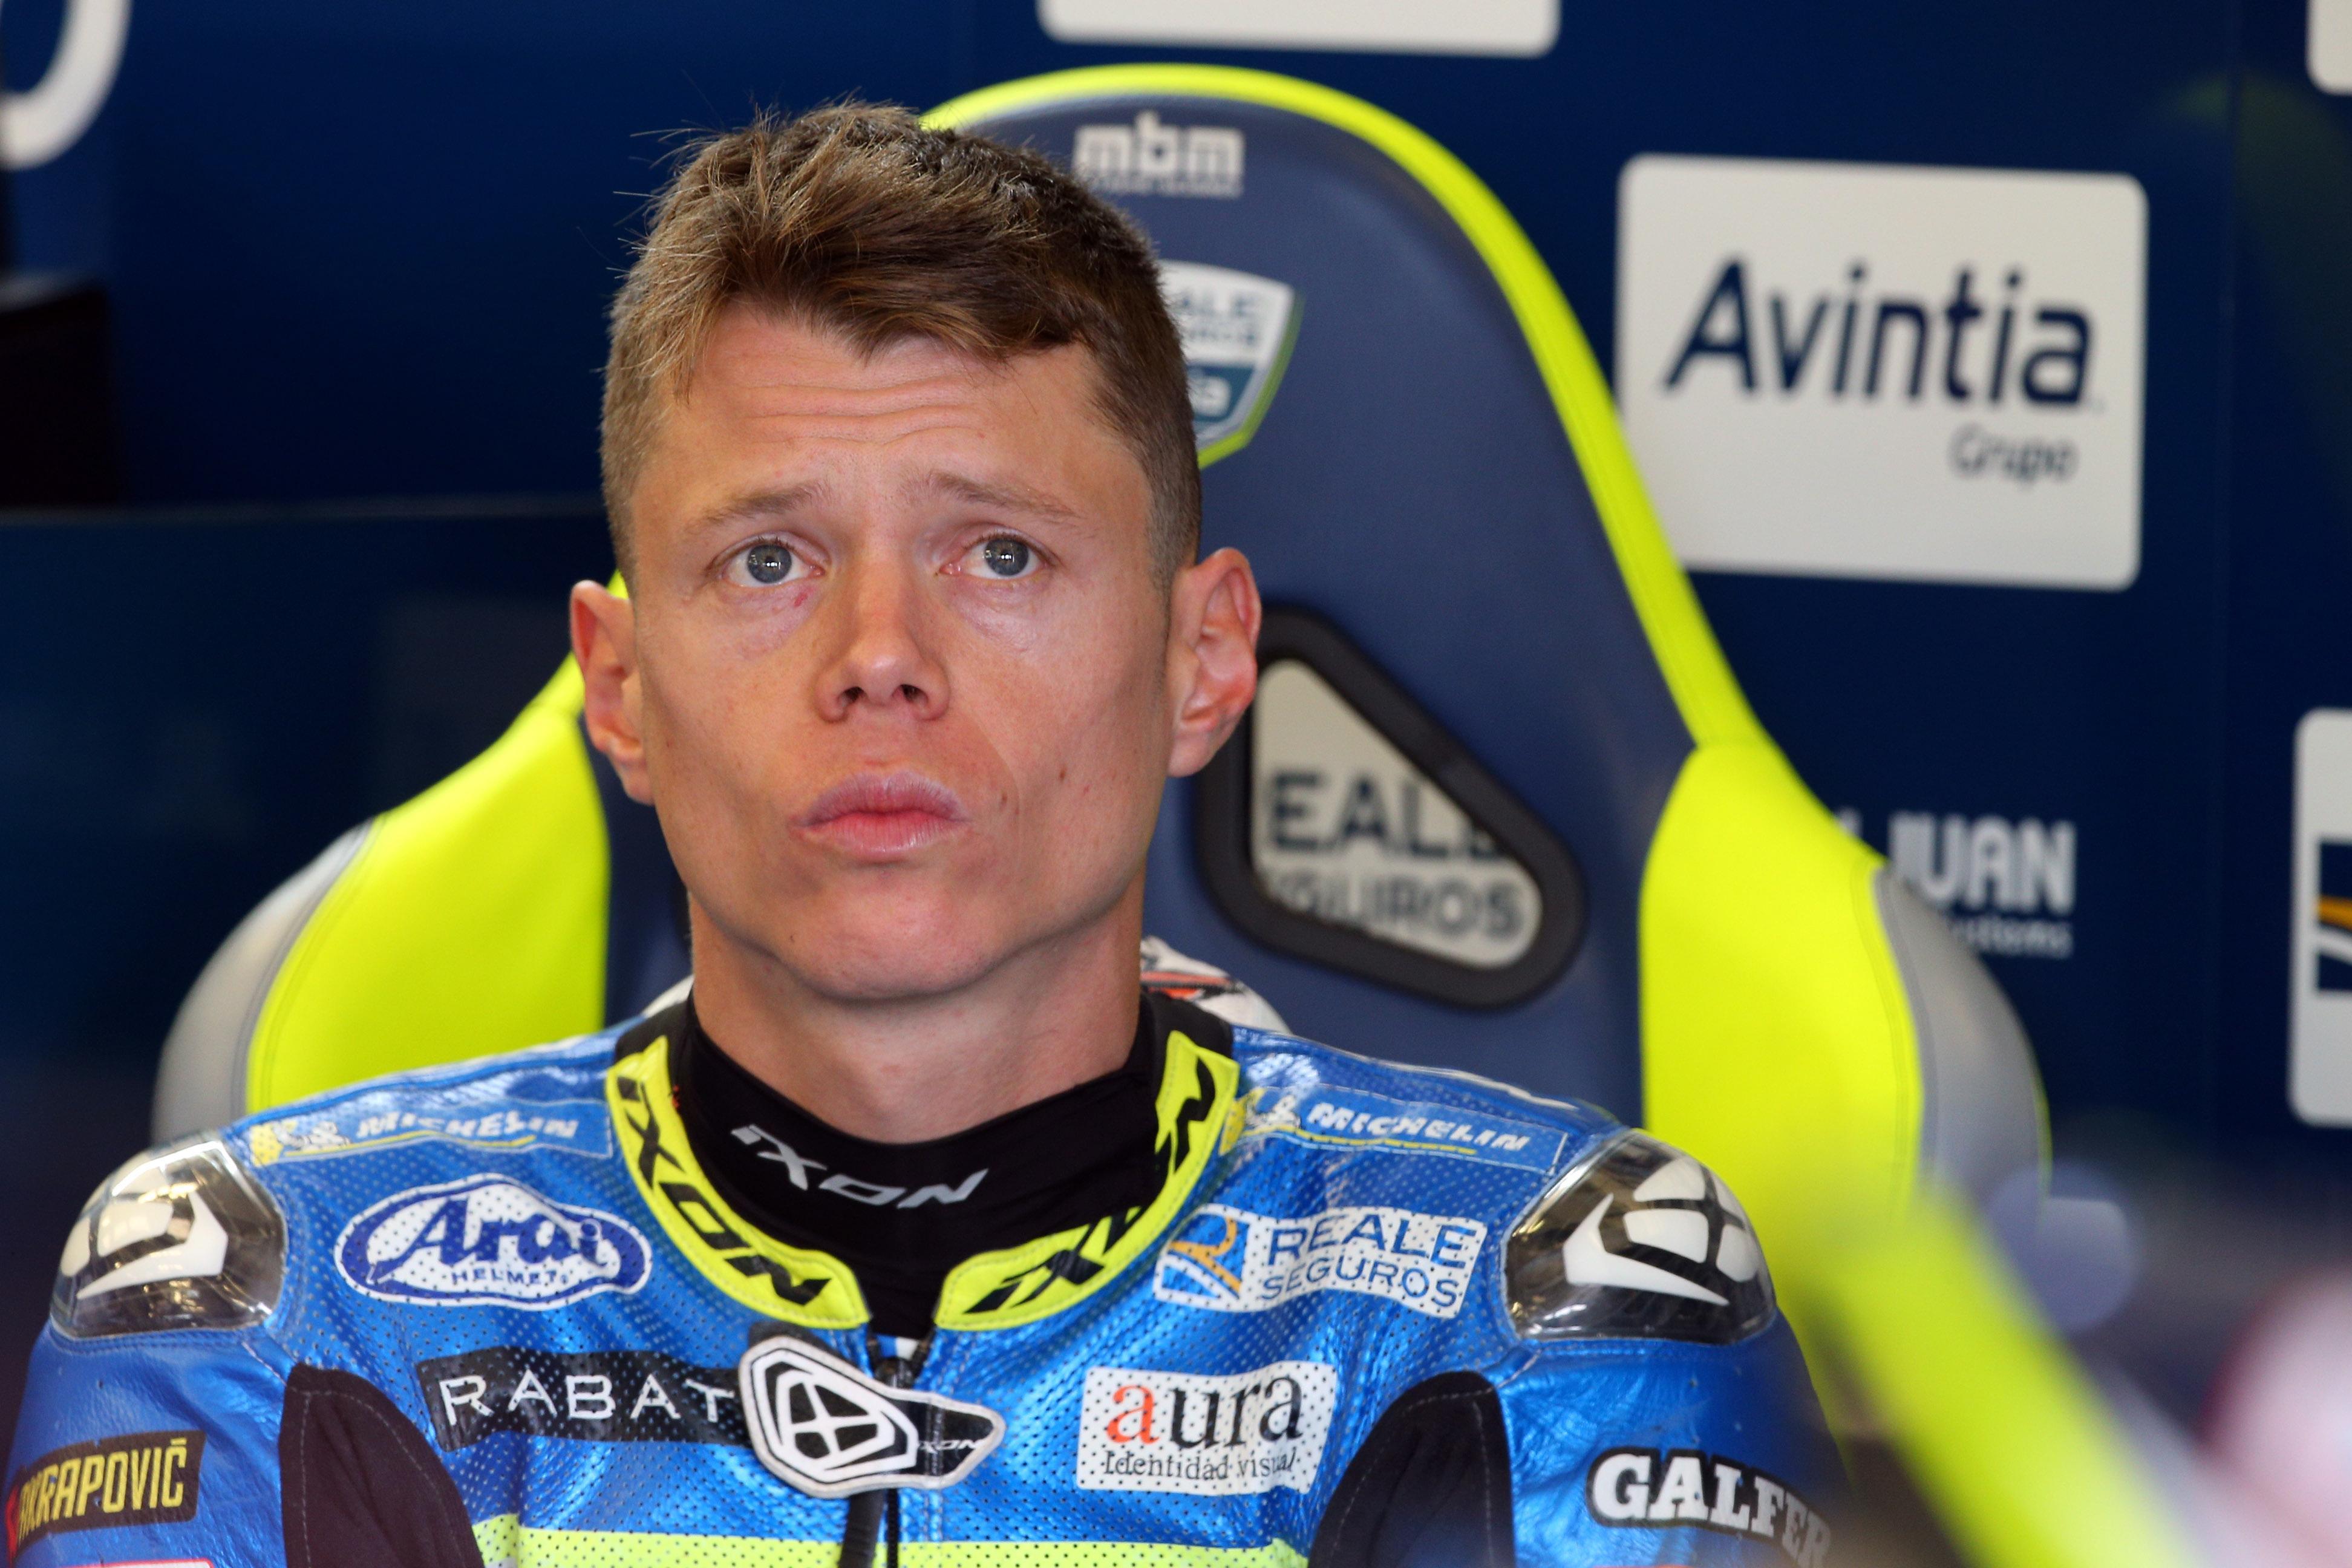 The Spaniard is into his third season in MotoGP